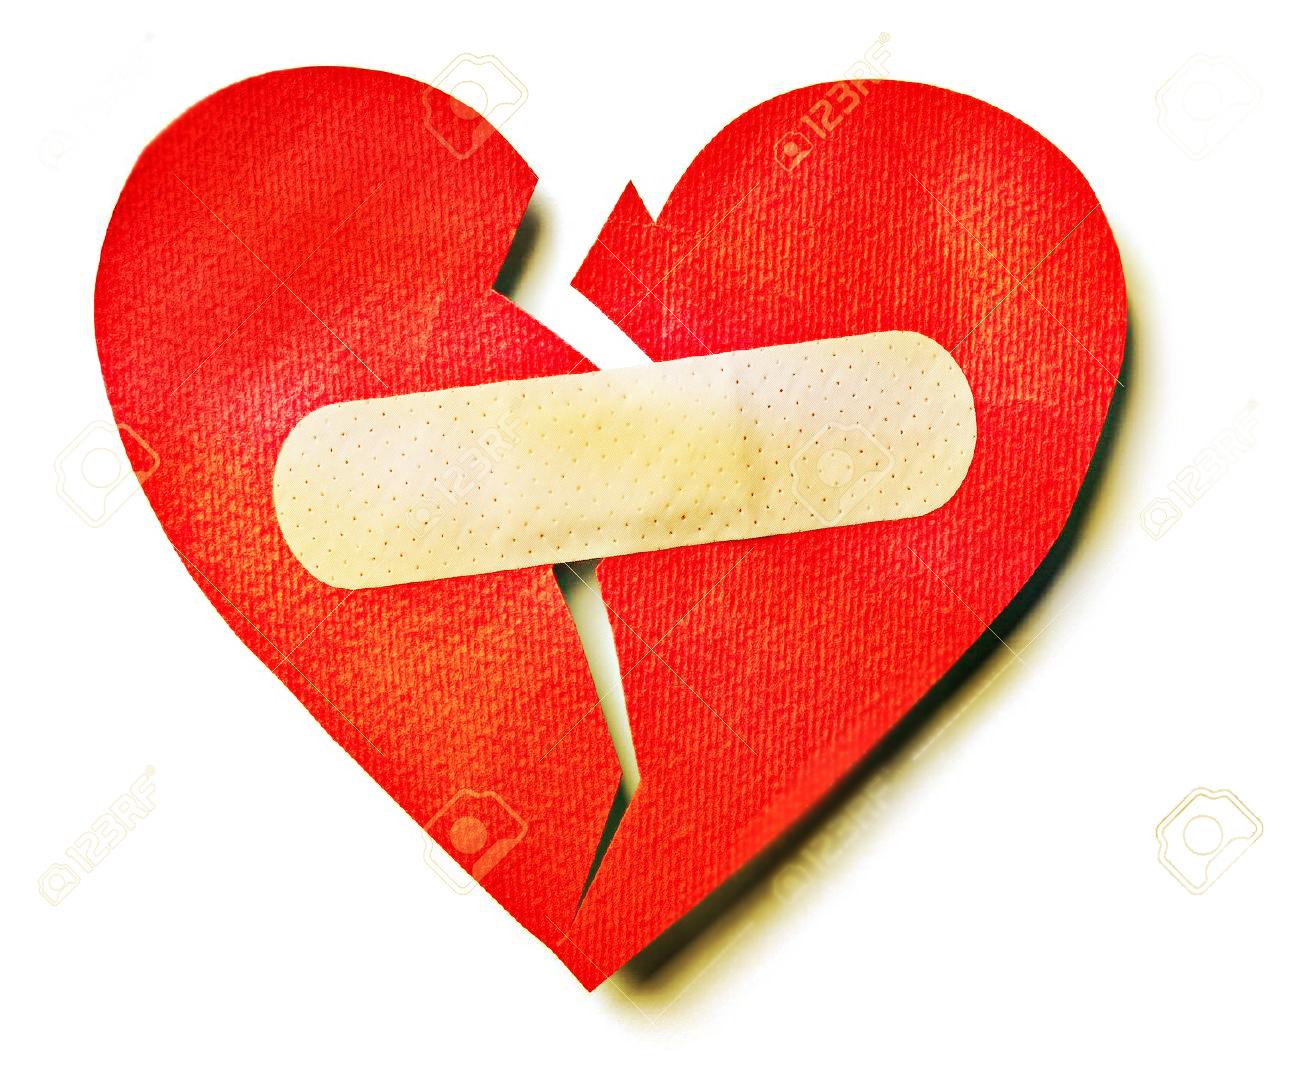 how to heal a broken heart copy